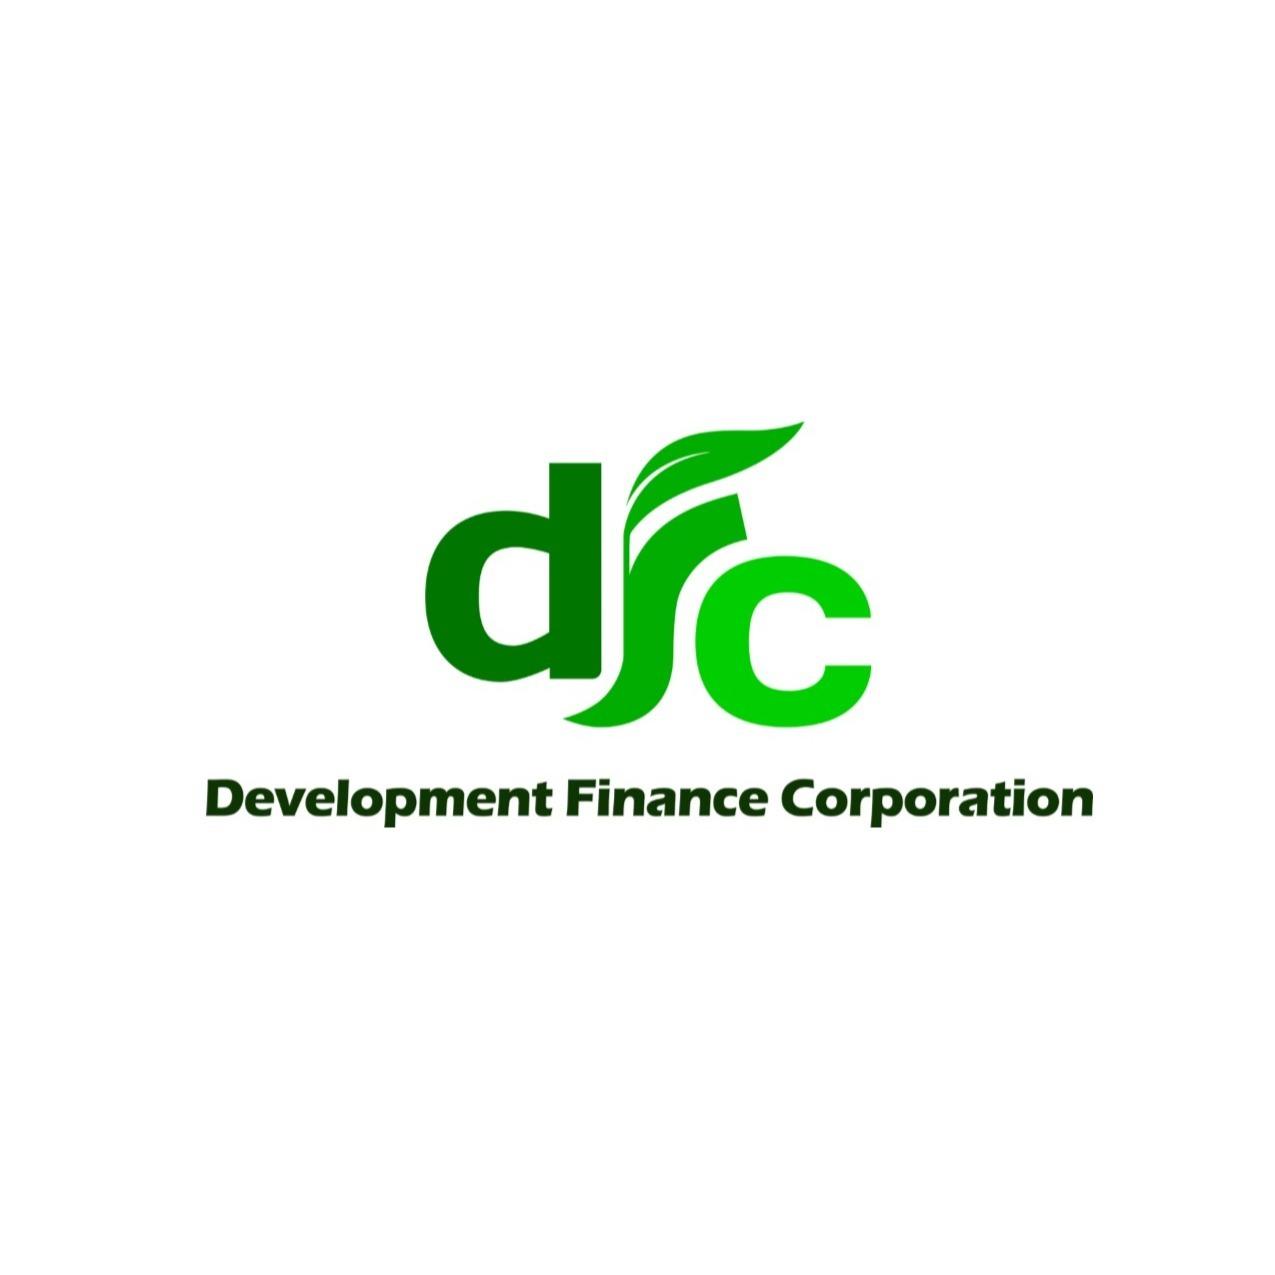 Development Finance Corporation